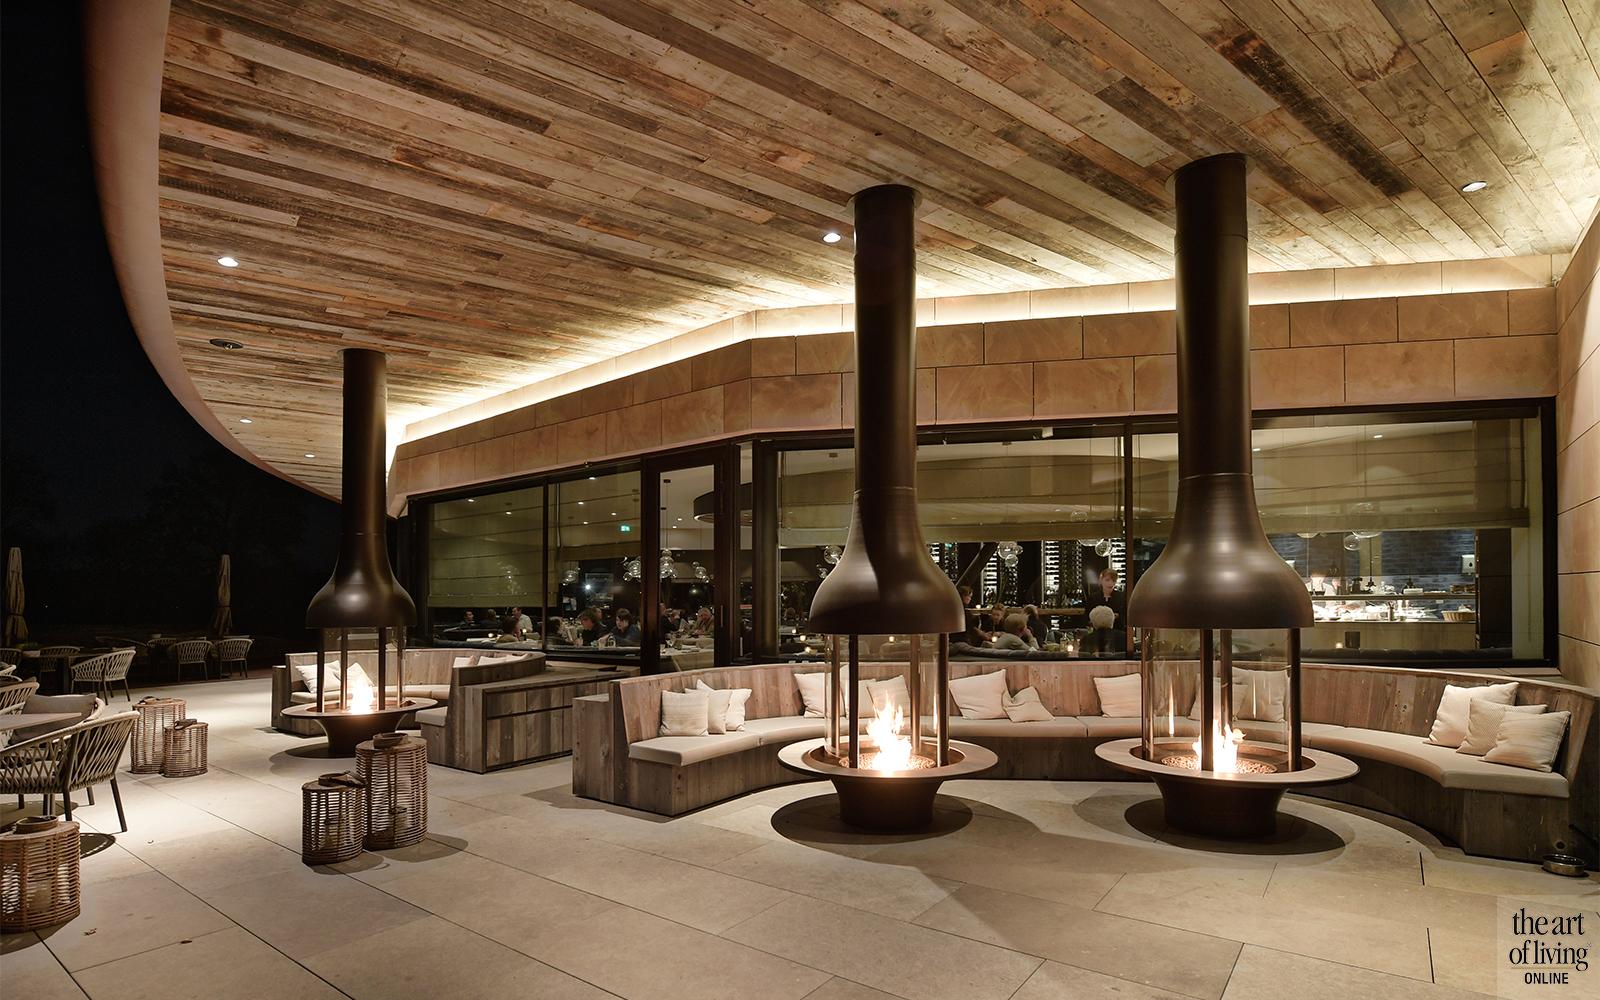 Bernardus golf, Patrick Russ Interiors, Luxueus, Zwembad, Golfbaan, Wellness, Ontspanning, Luxe